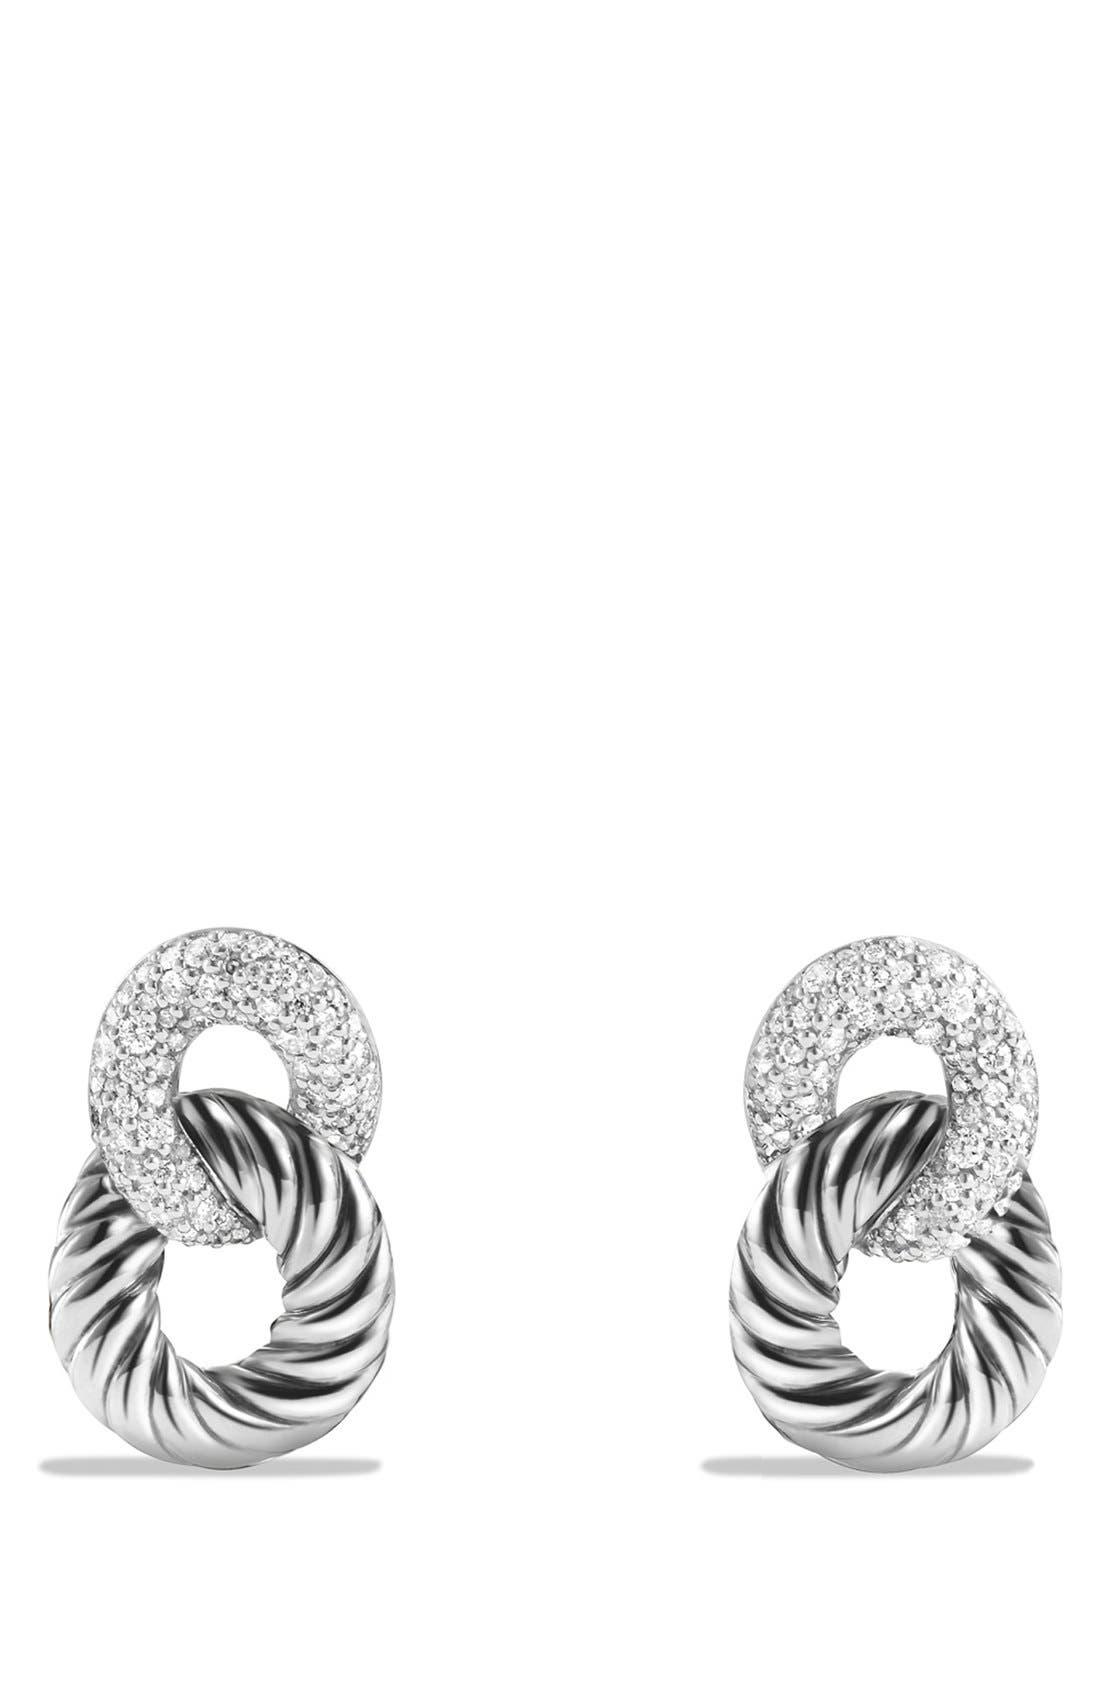 David Yurman'Belmont Curb Link' Drop Earrings with Diamonds